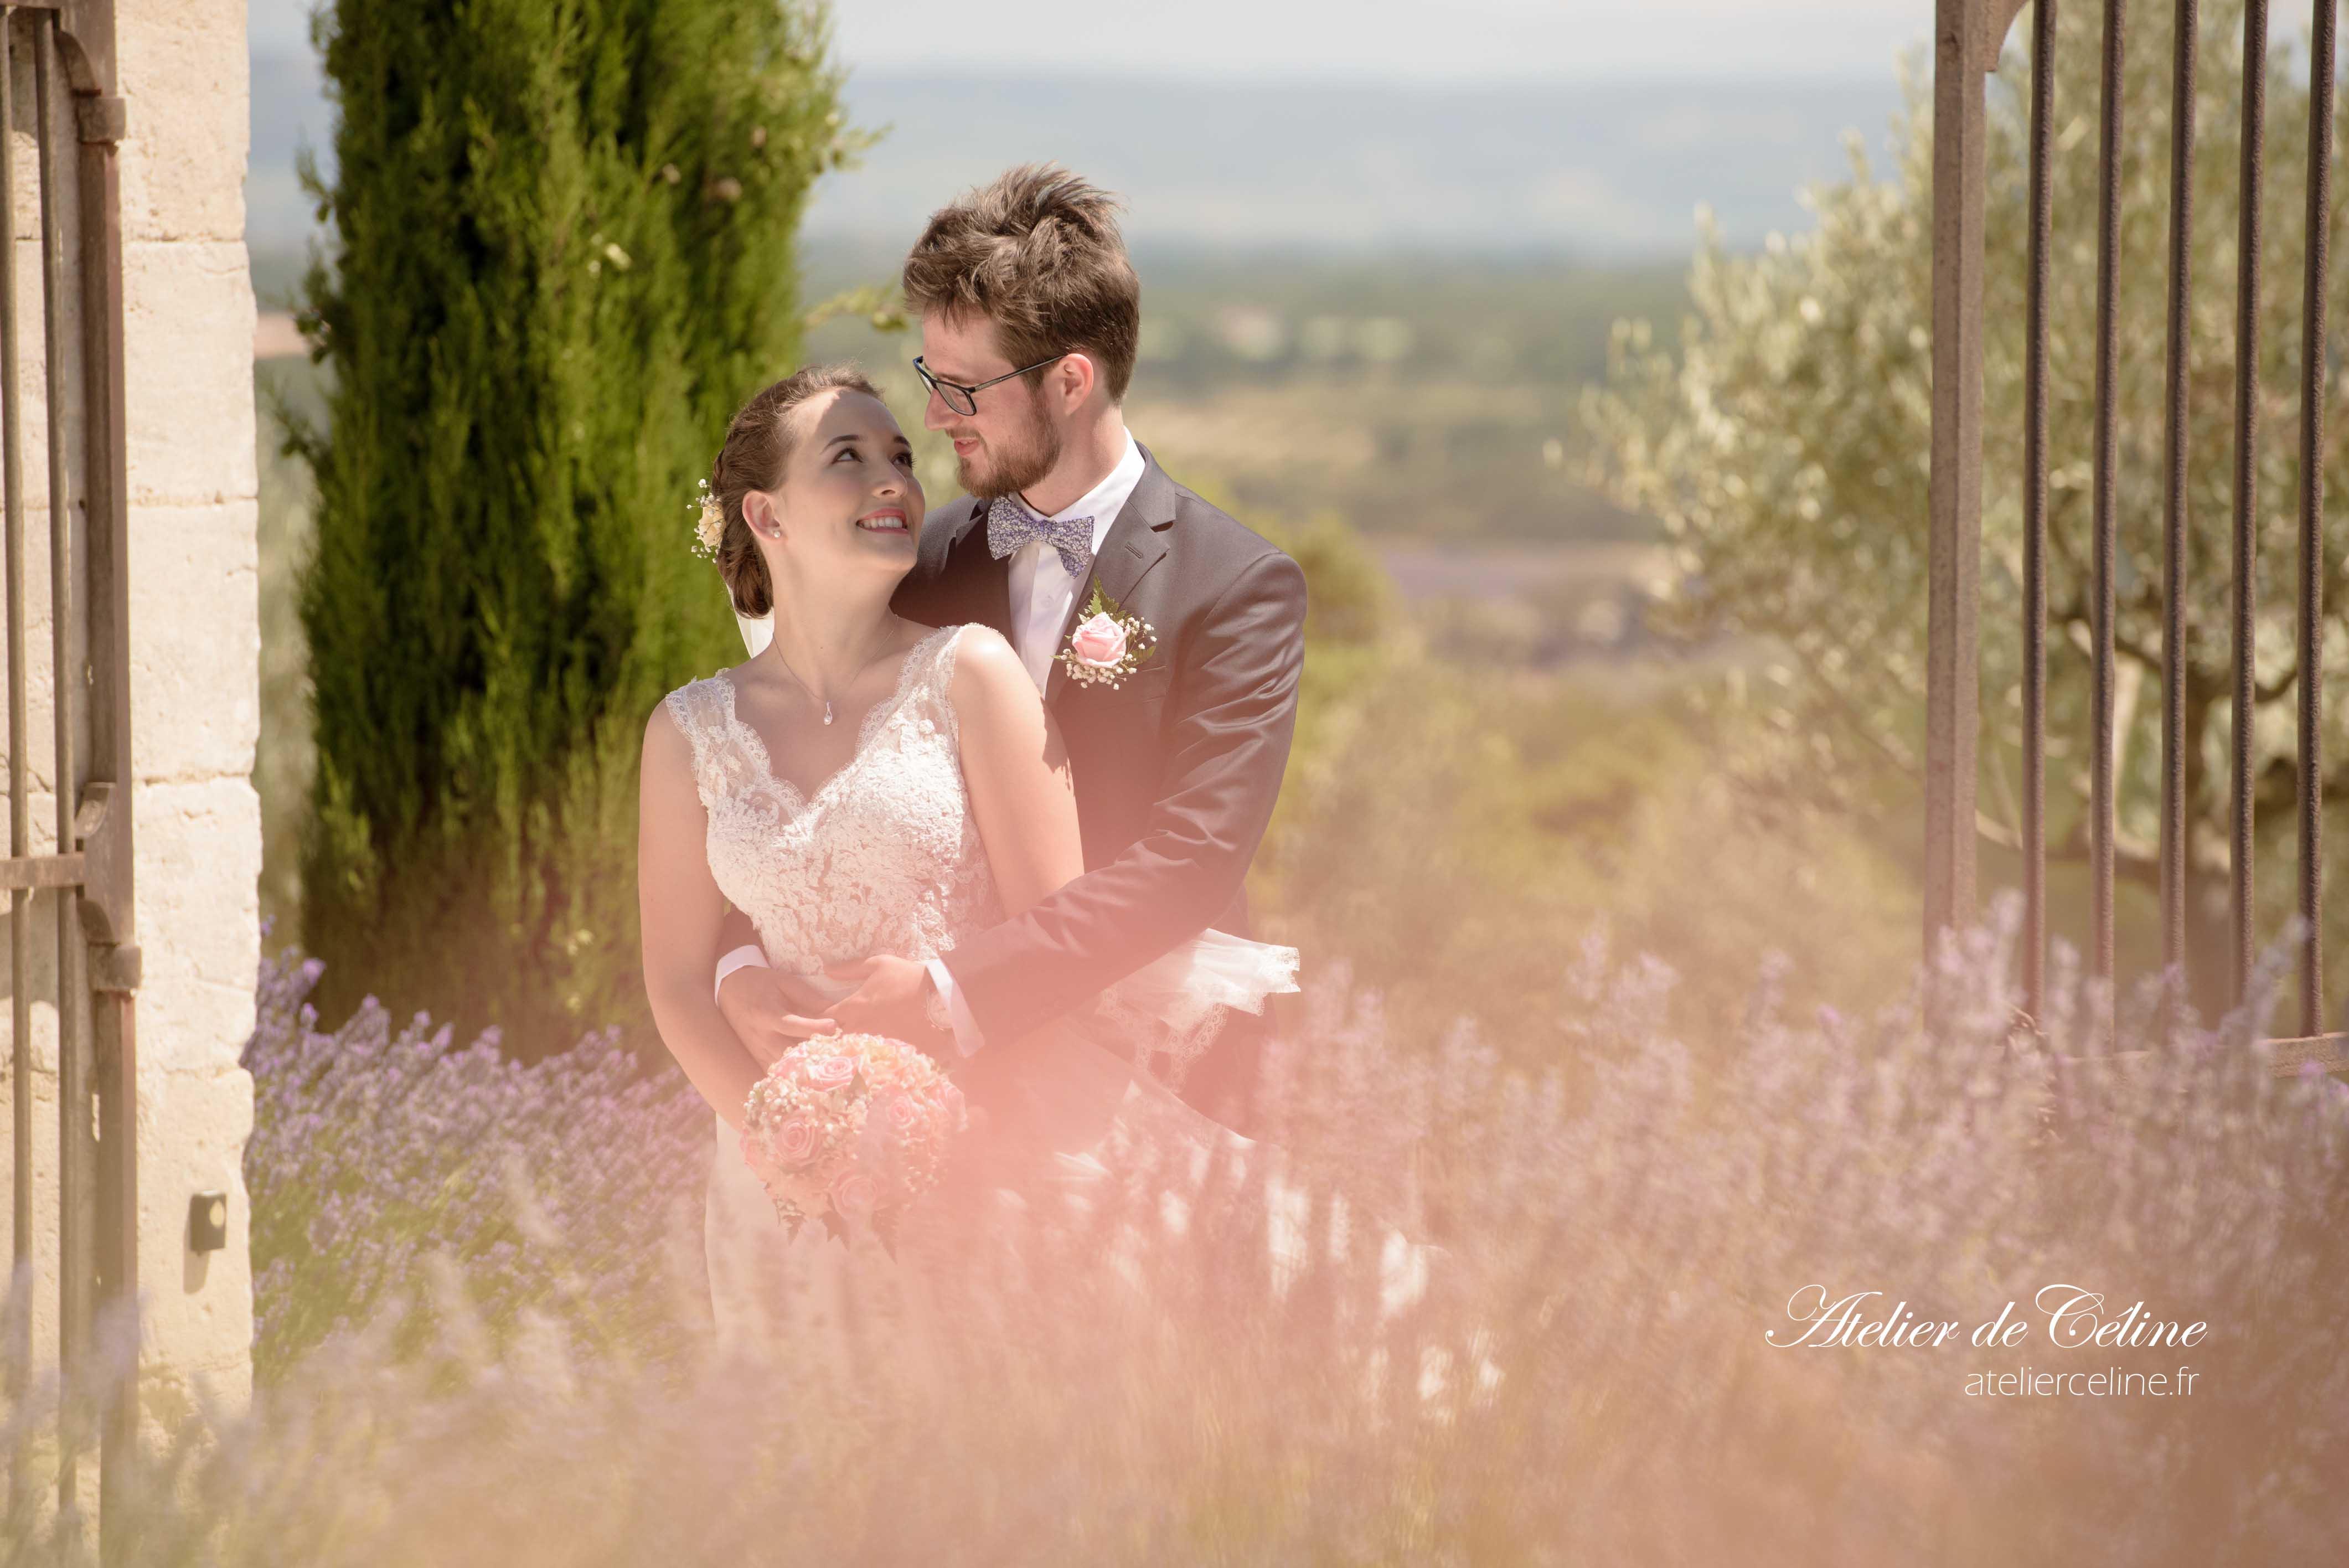 Mariage, photos de couple, shooting adulte, extérieures (4)